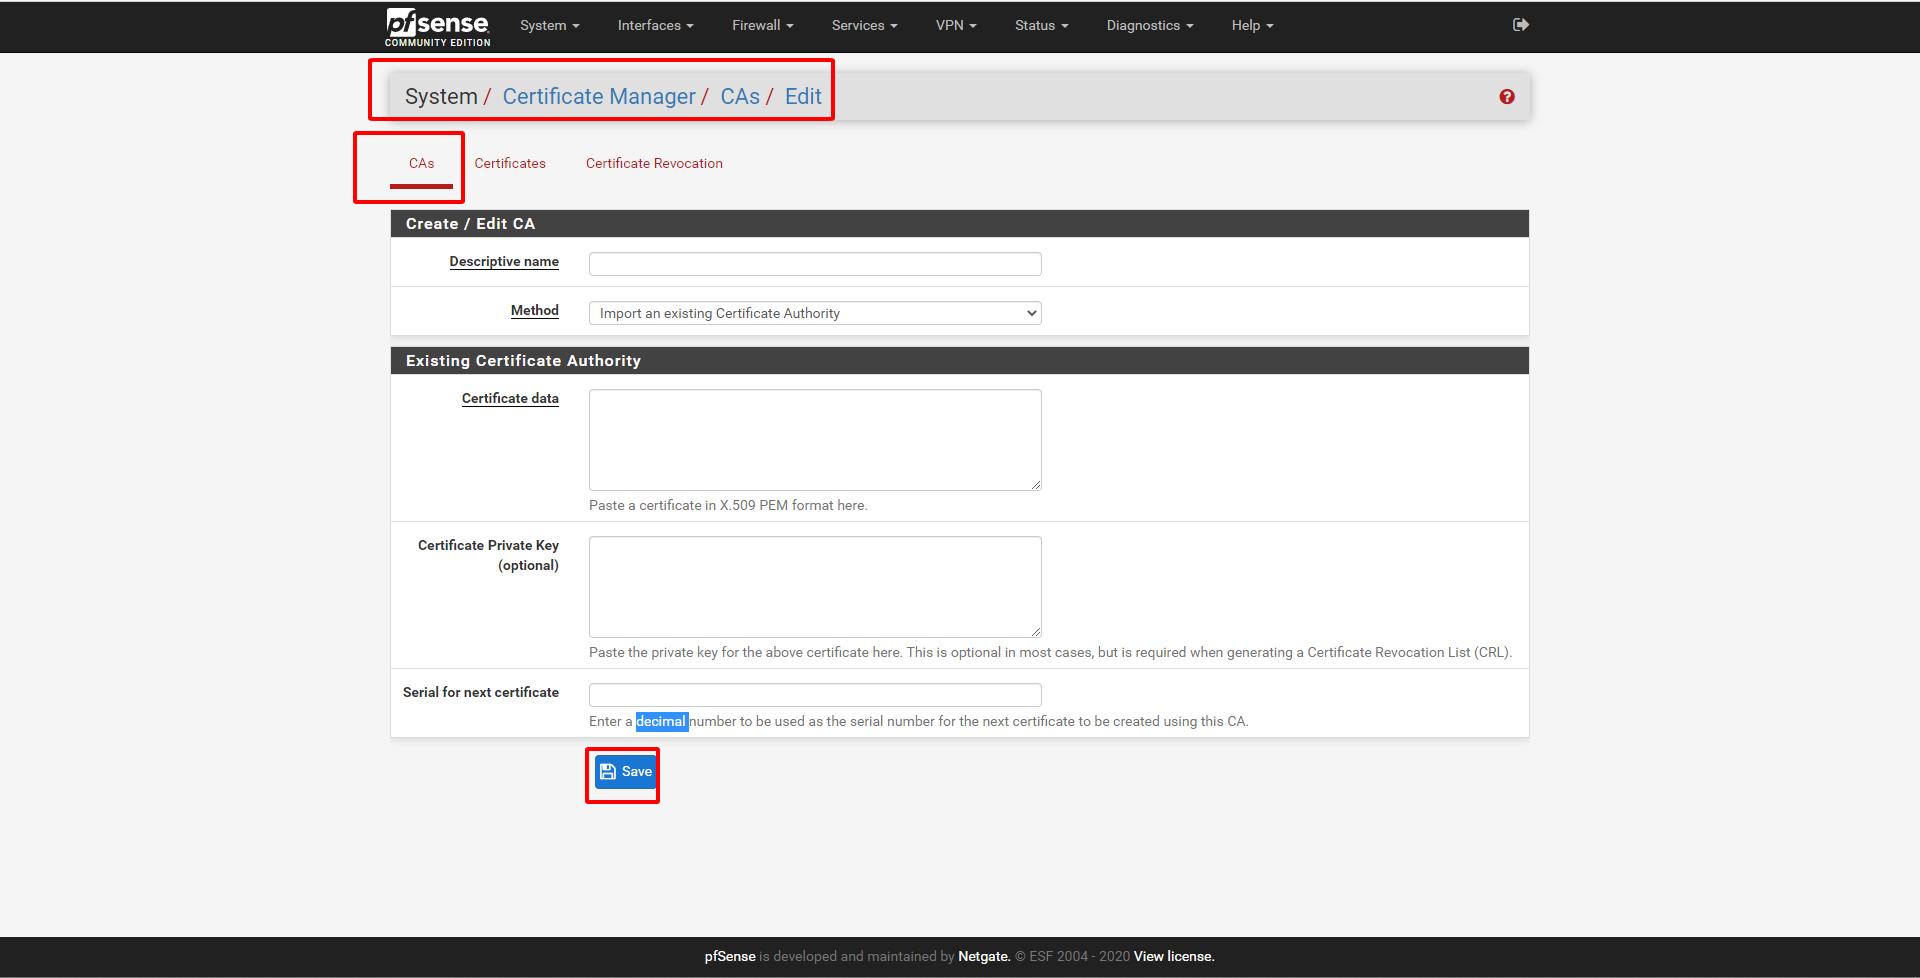 pfsense 8 - Certificate Management (Tìm Hiểu Về PfSense Phần 8)